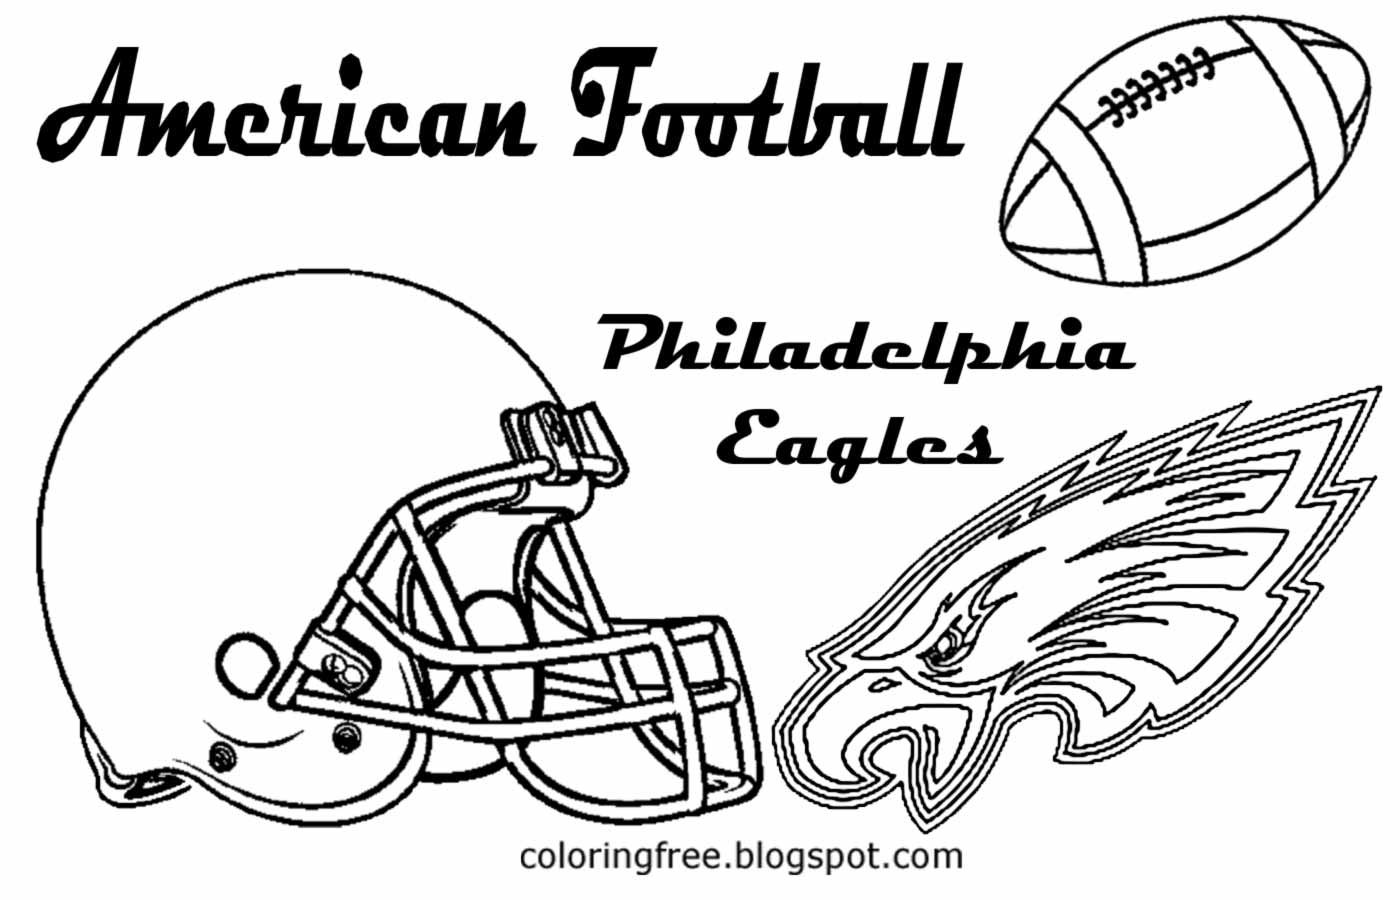 Free Printable Philadelphia Eagles Coloring Pages To Print Football Coloring Pages Coloring Pages Coloring Pages To Print